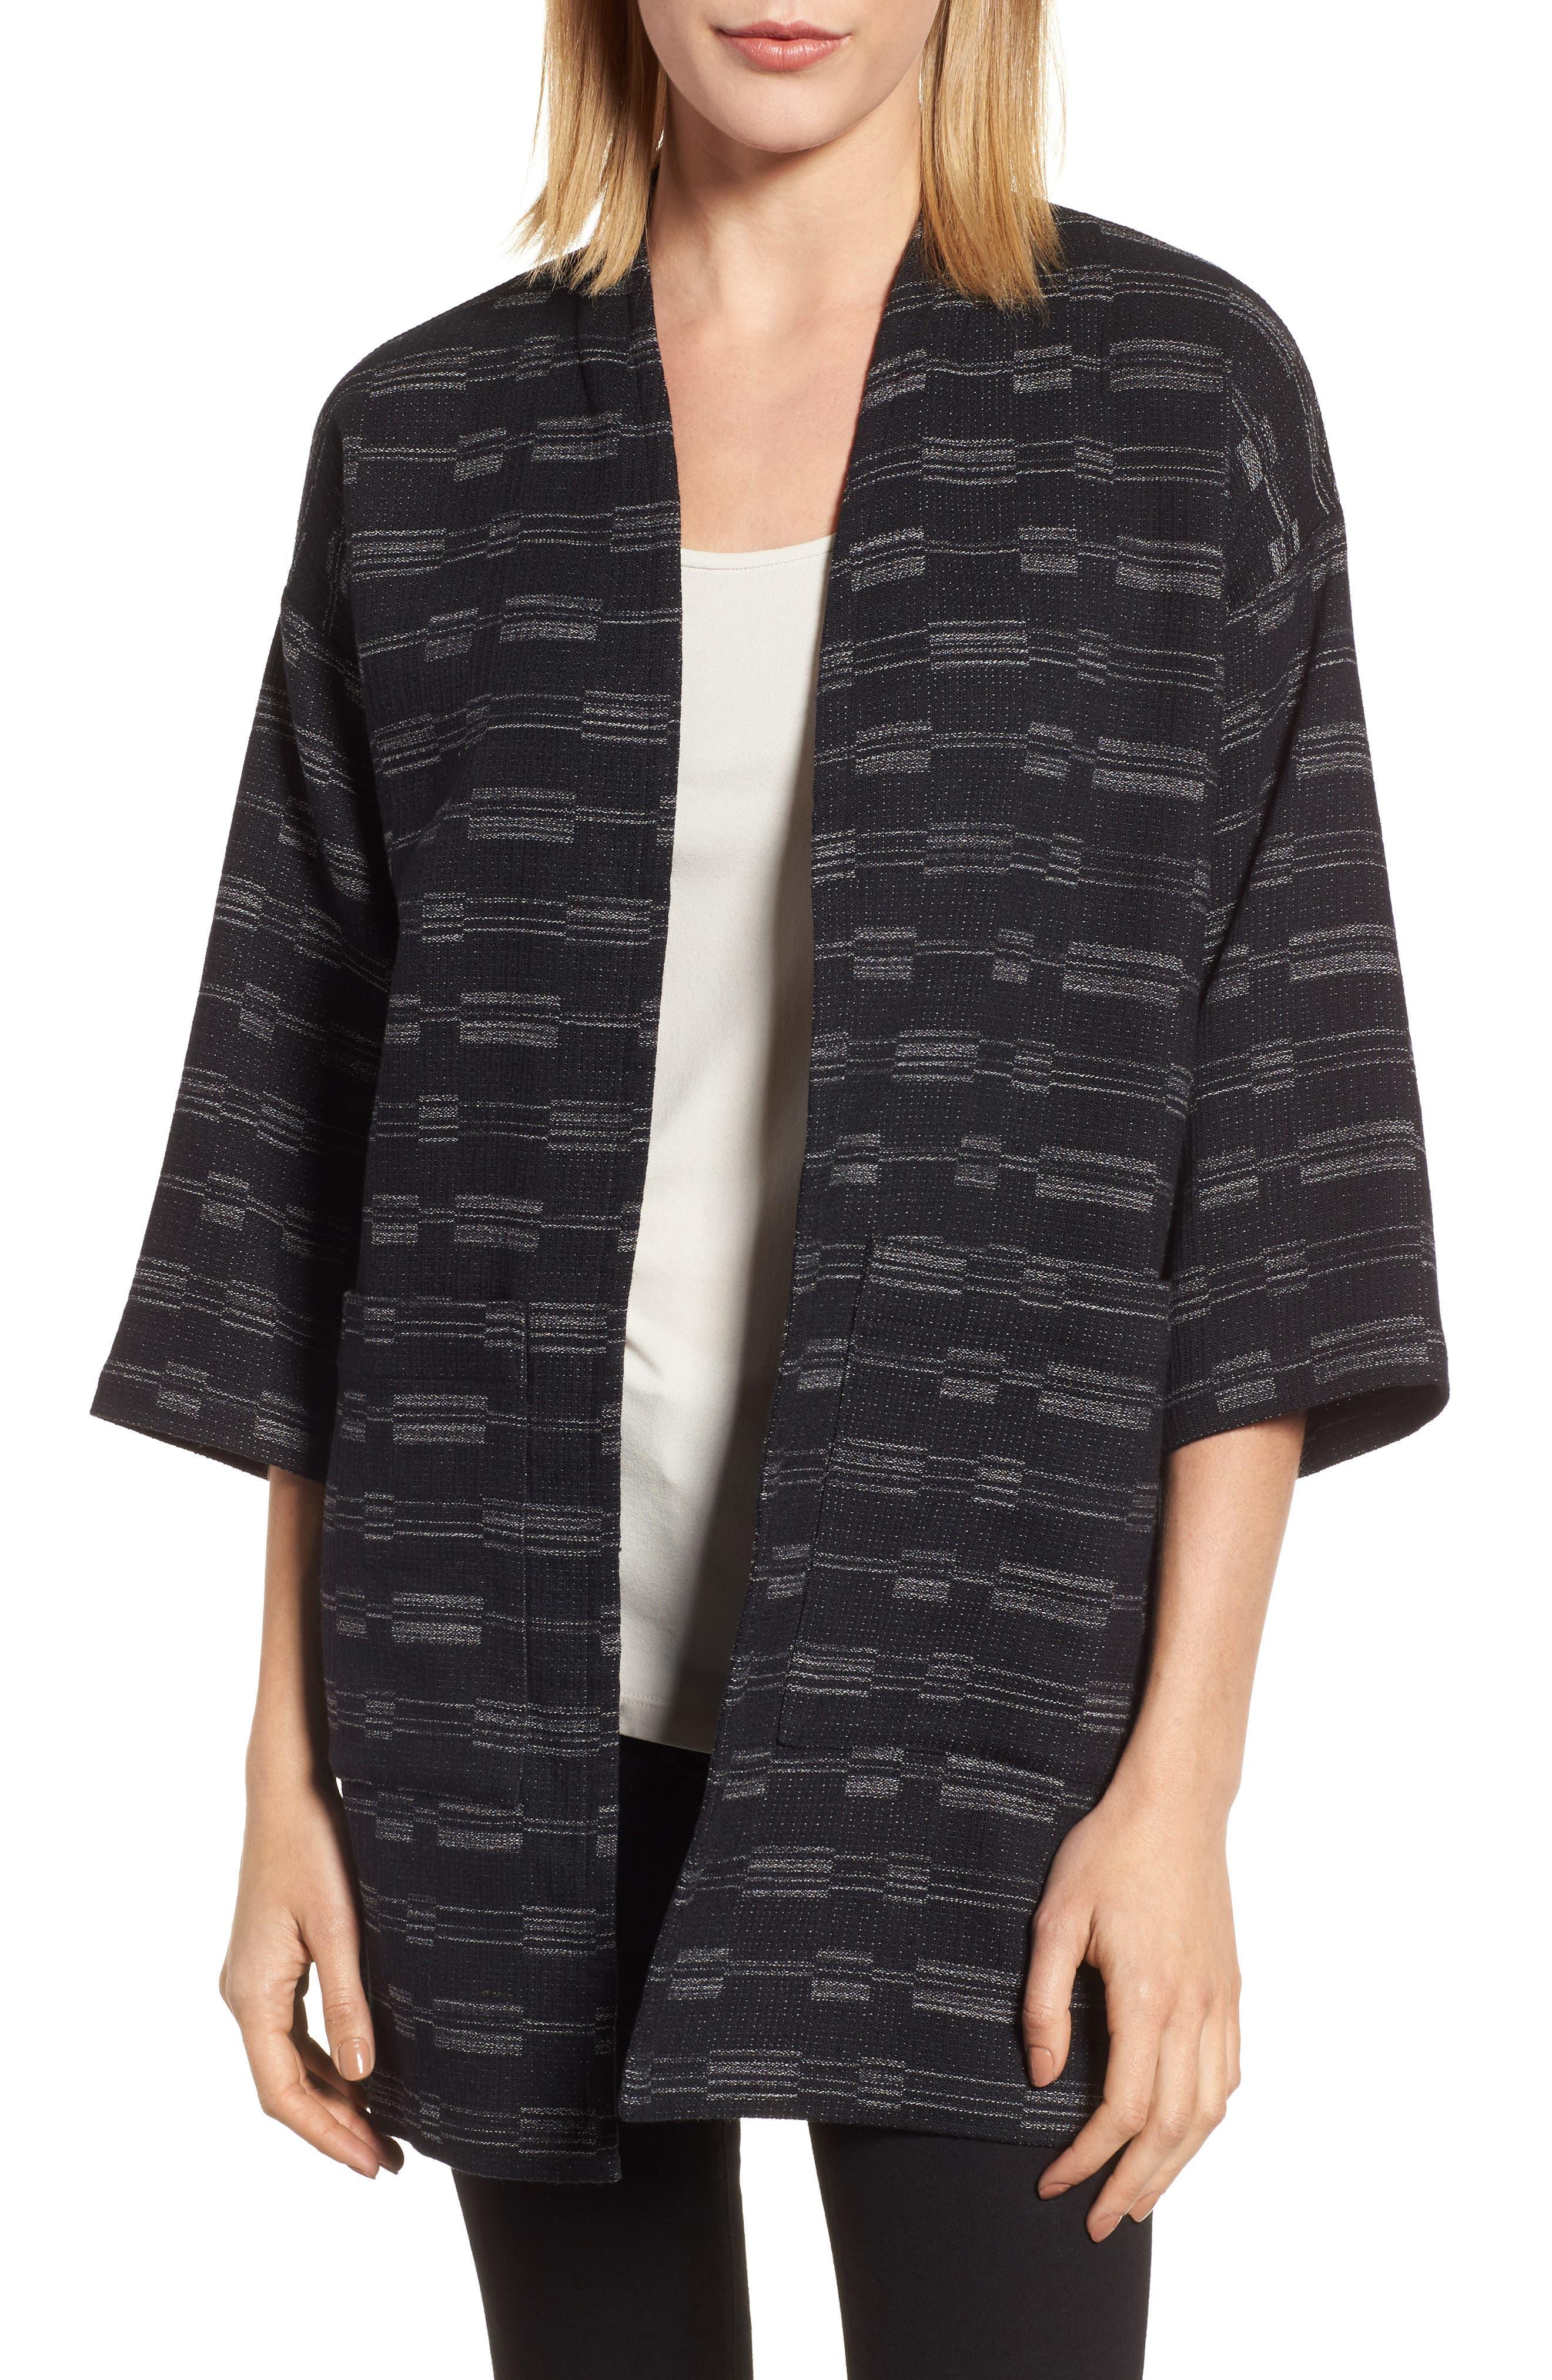 Eileen Fisher Organic Cotton Blend Tweed Jacket